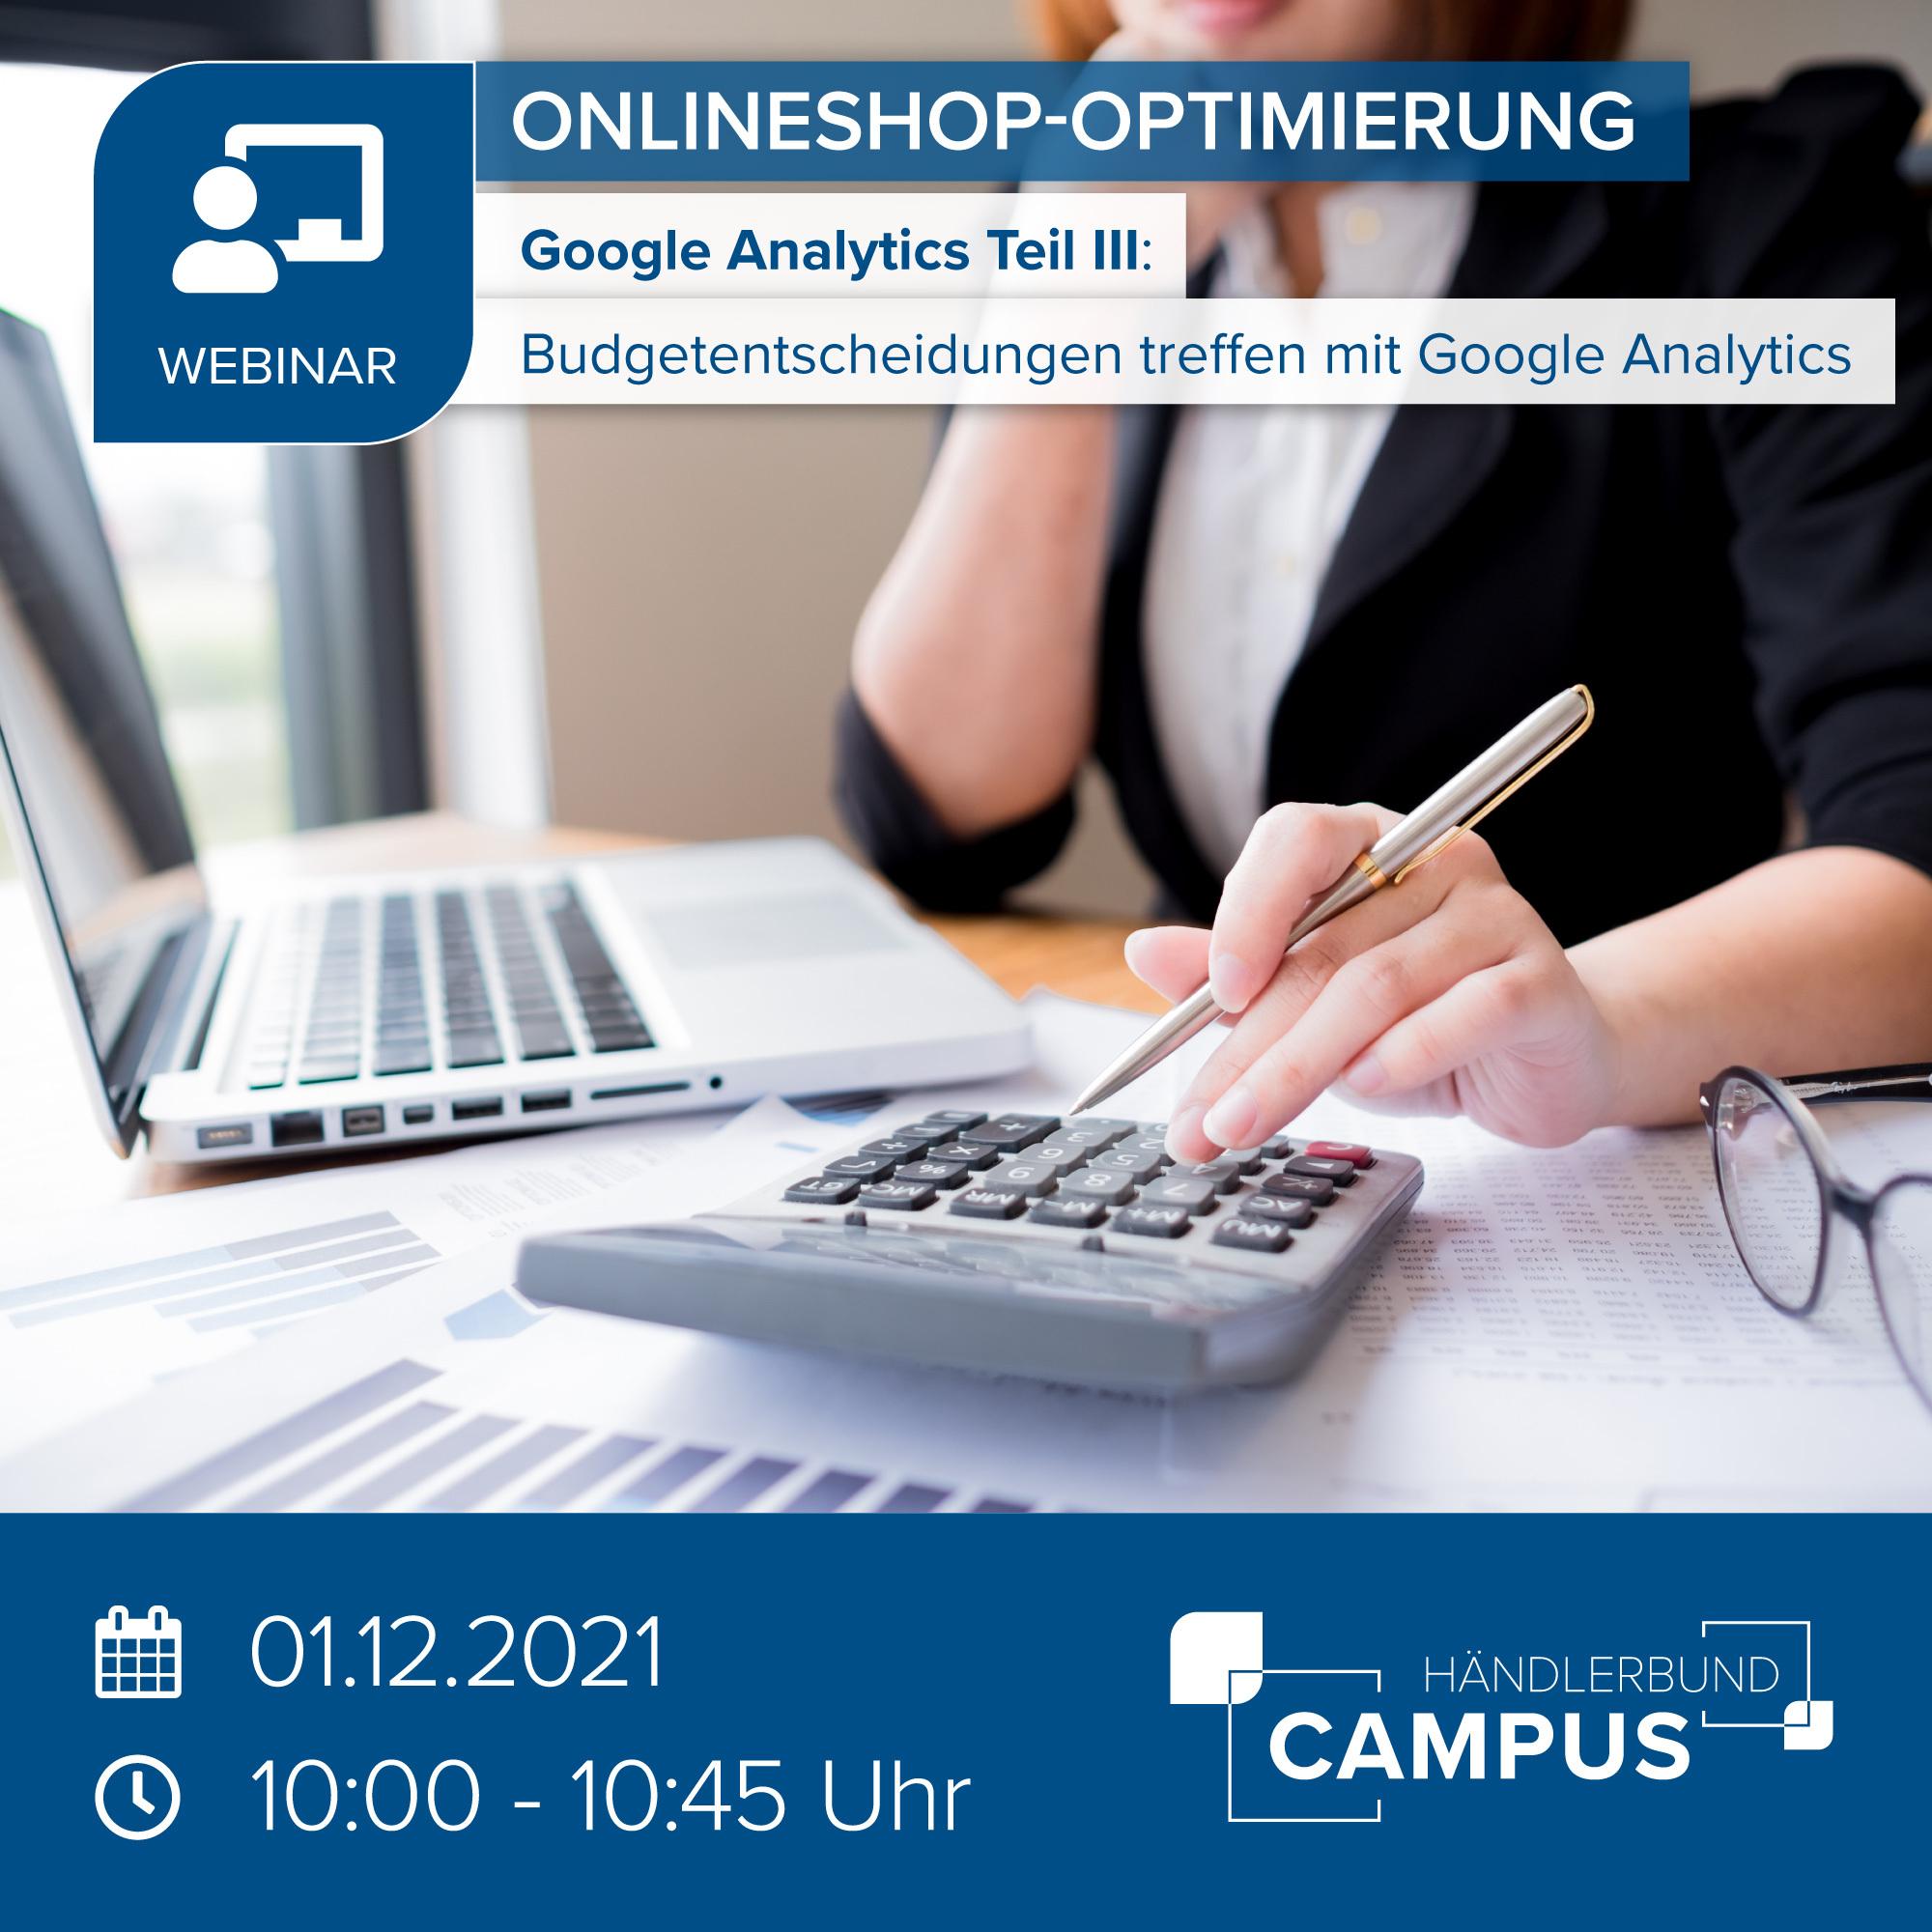 SHOP-OPTIMIERUNG-Google Analytics-III_2000x2000-1